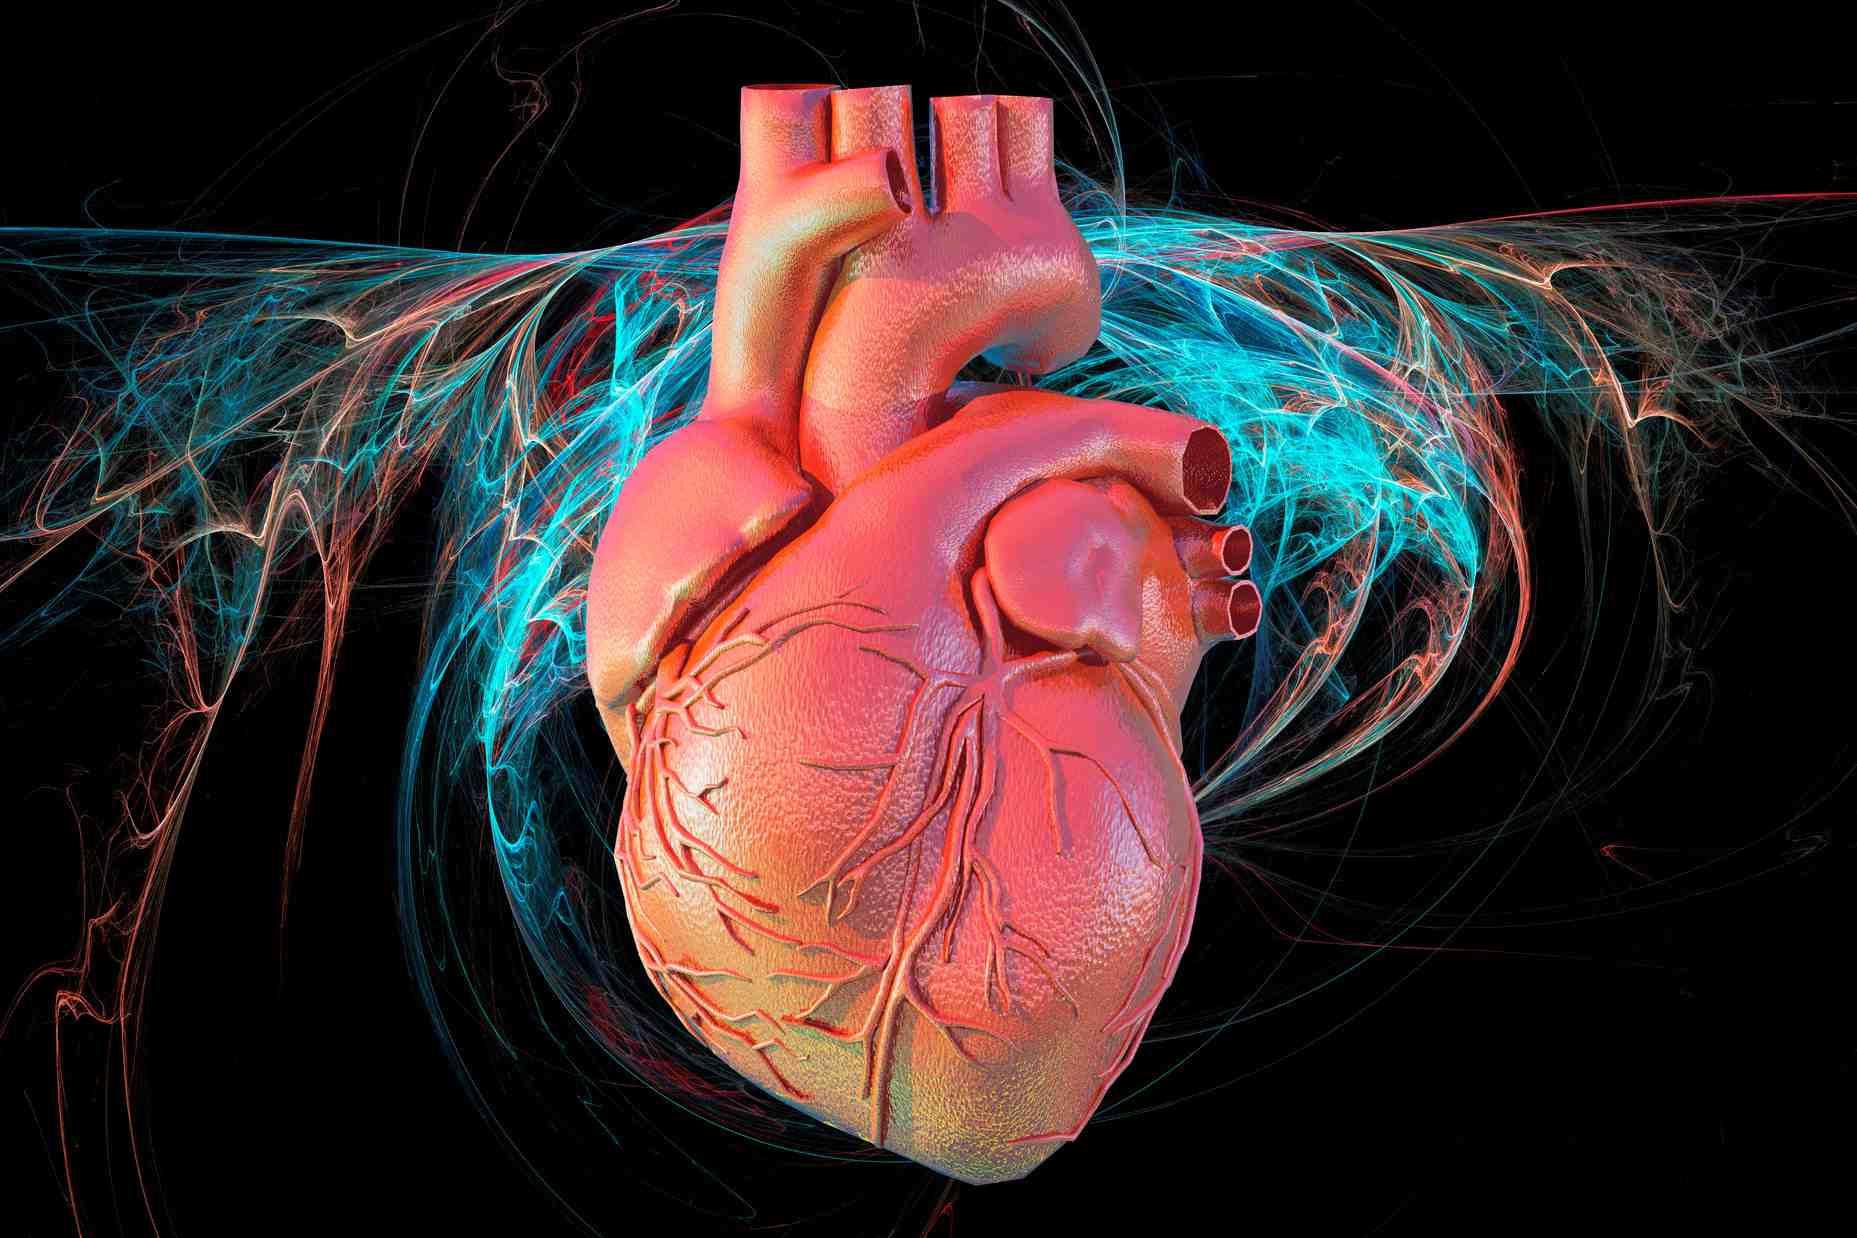 Illustration of a human heart